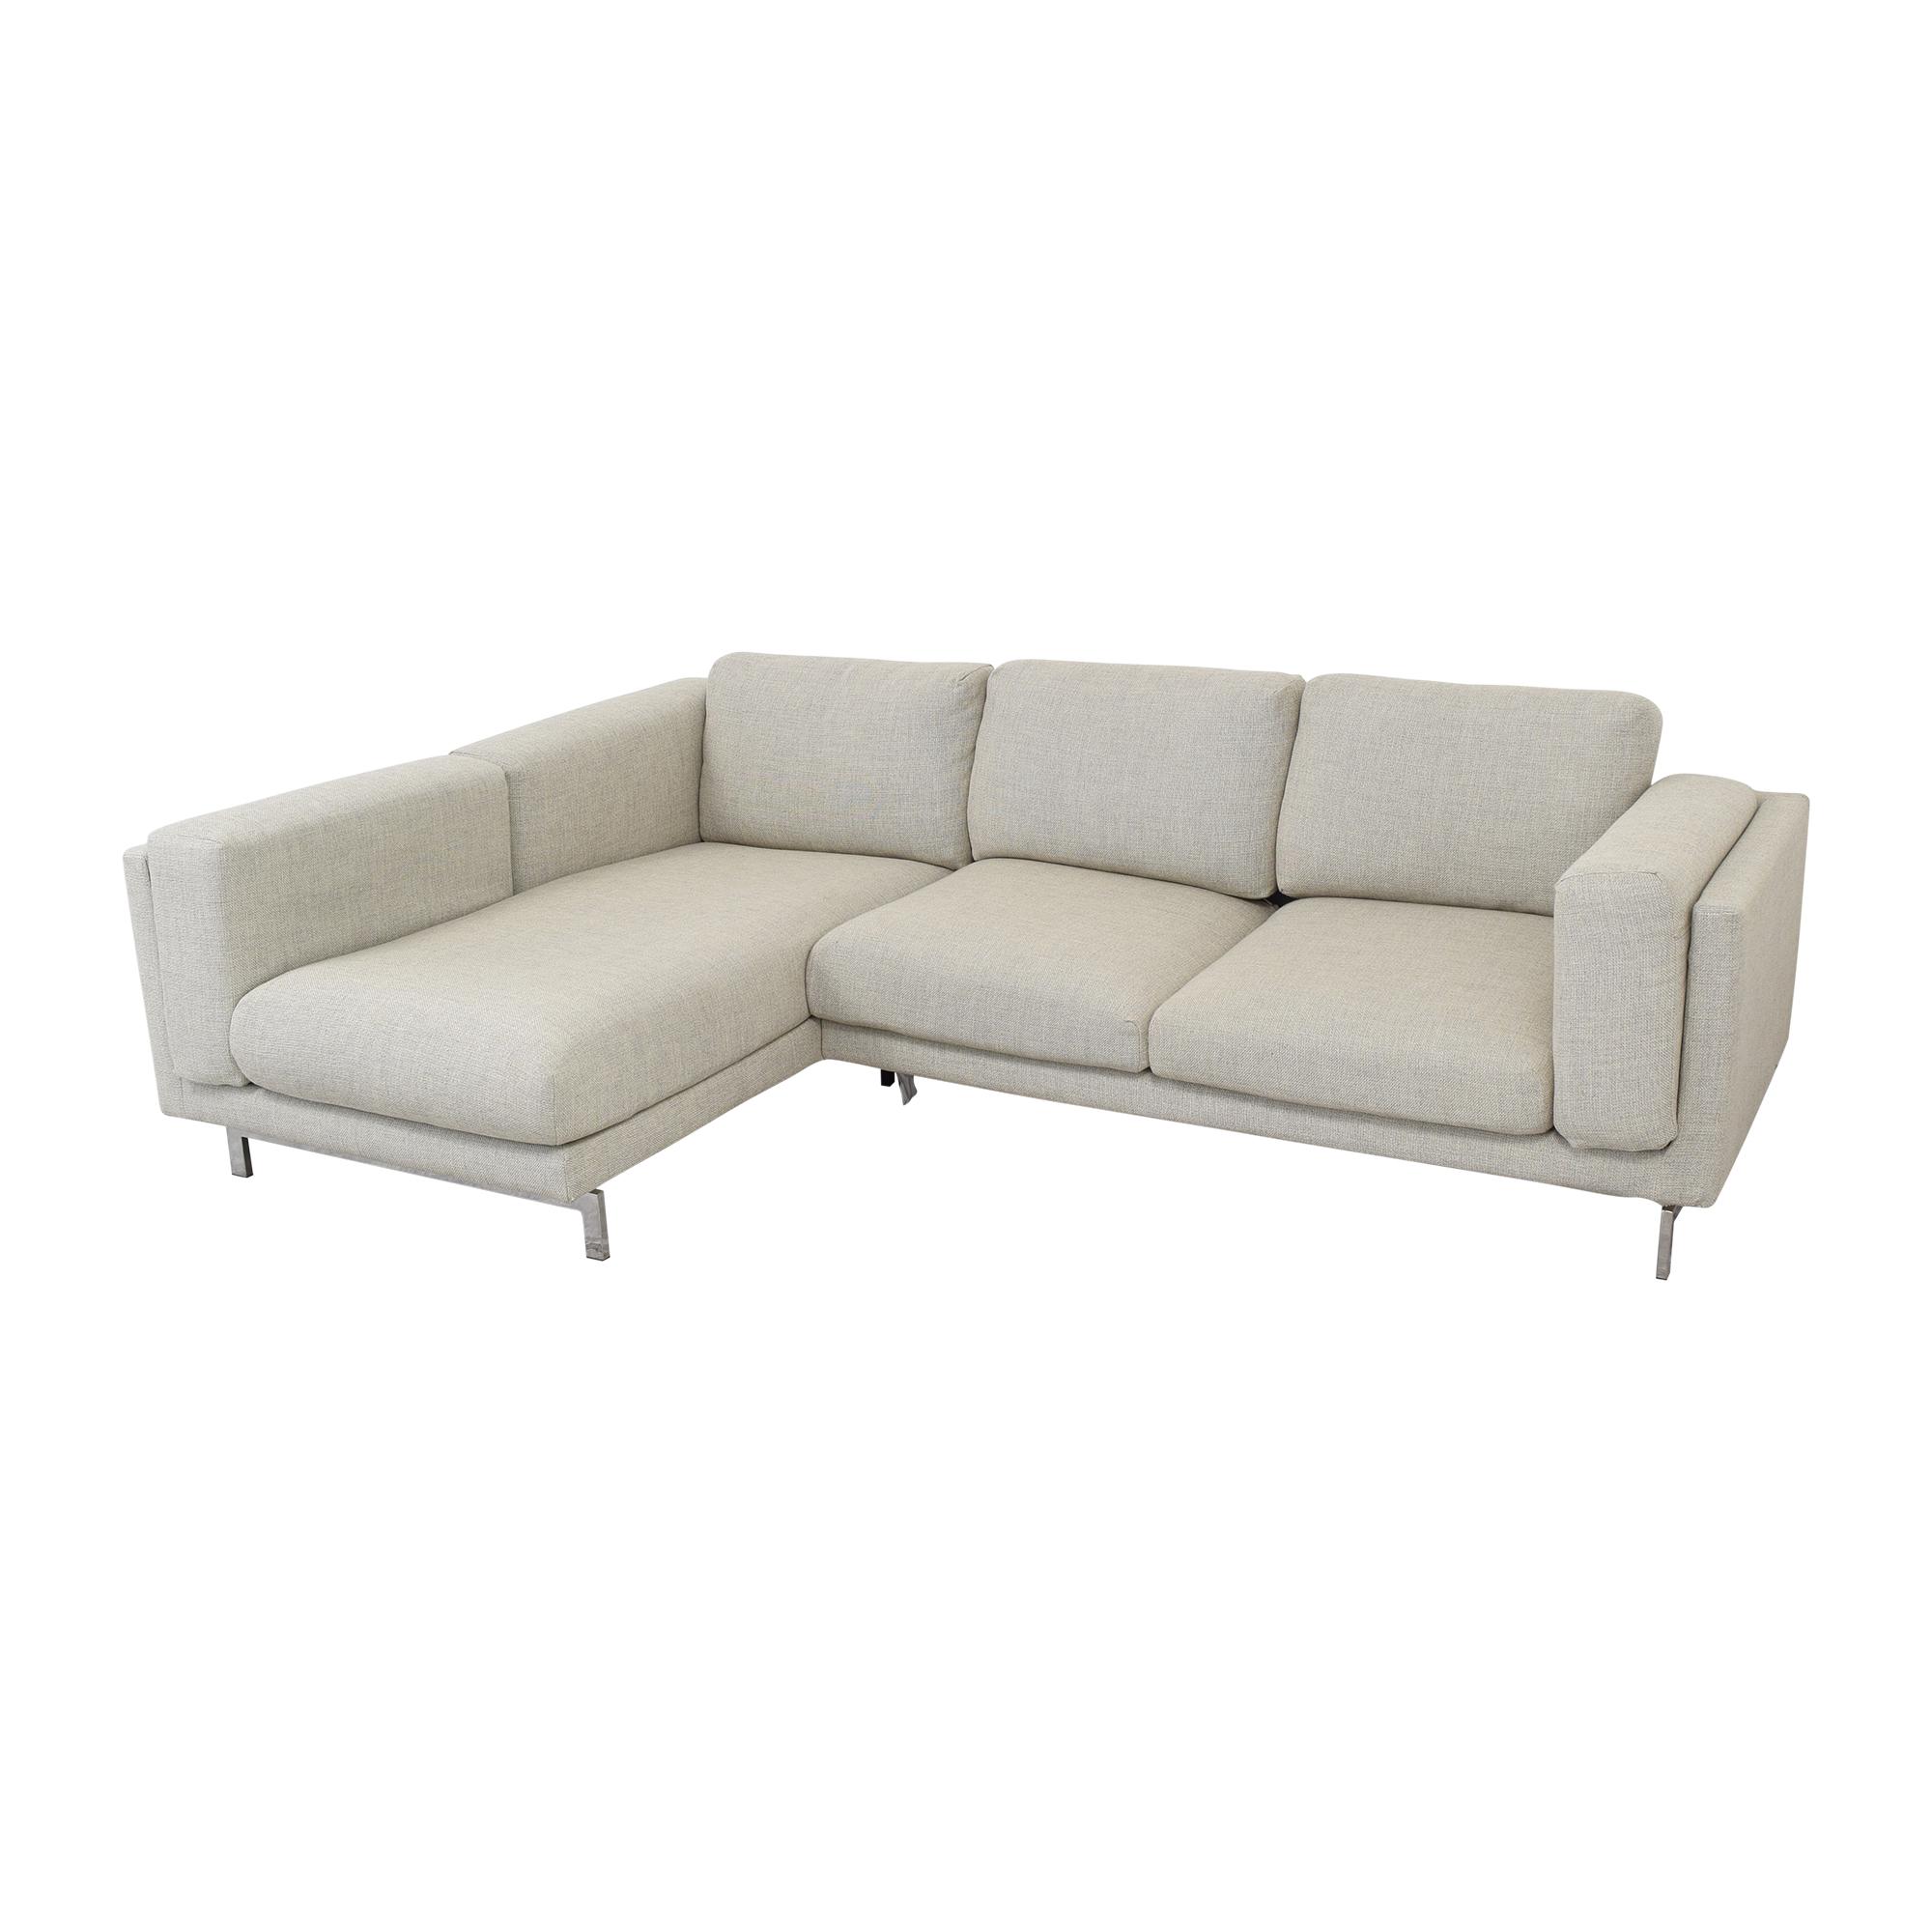 IKEA IKEA Nockeby Three Seat Sofa on sale